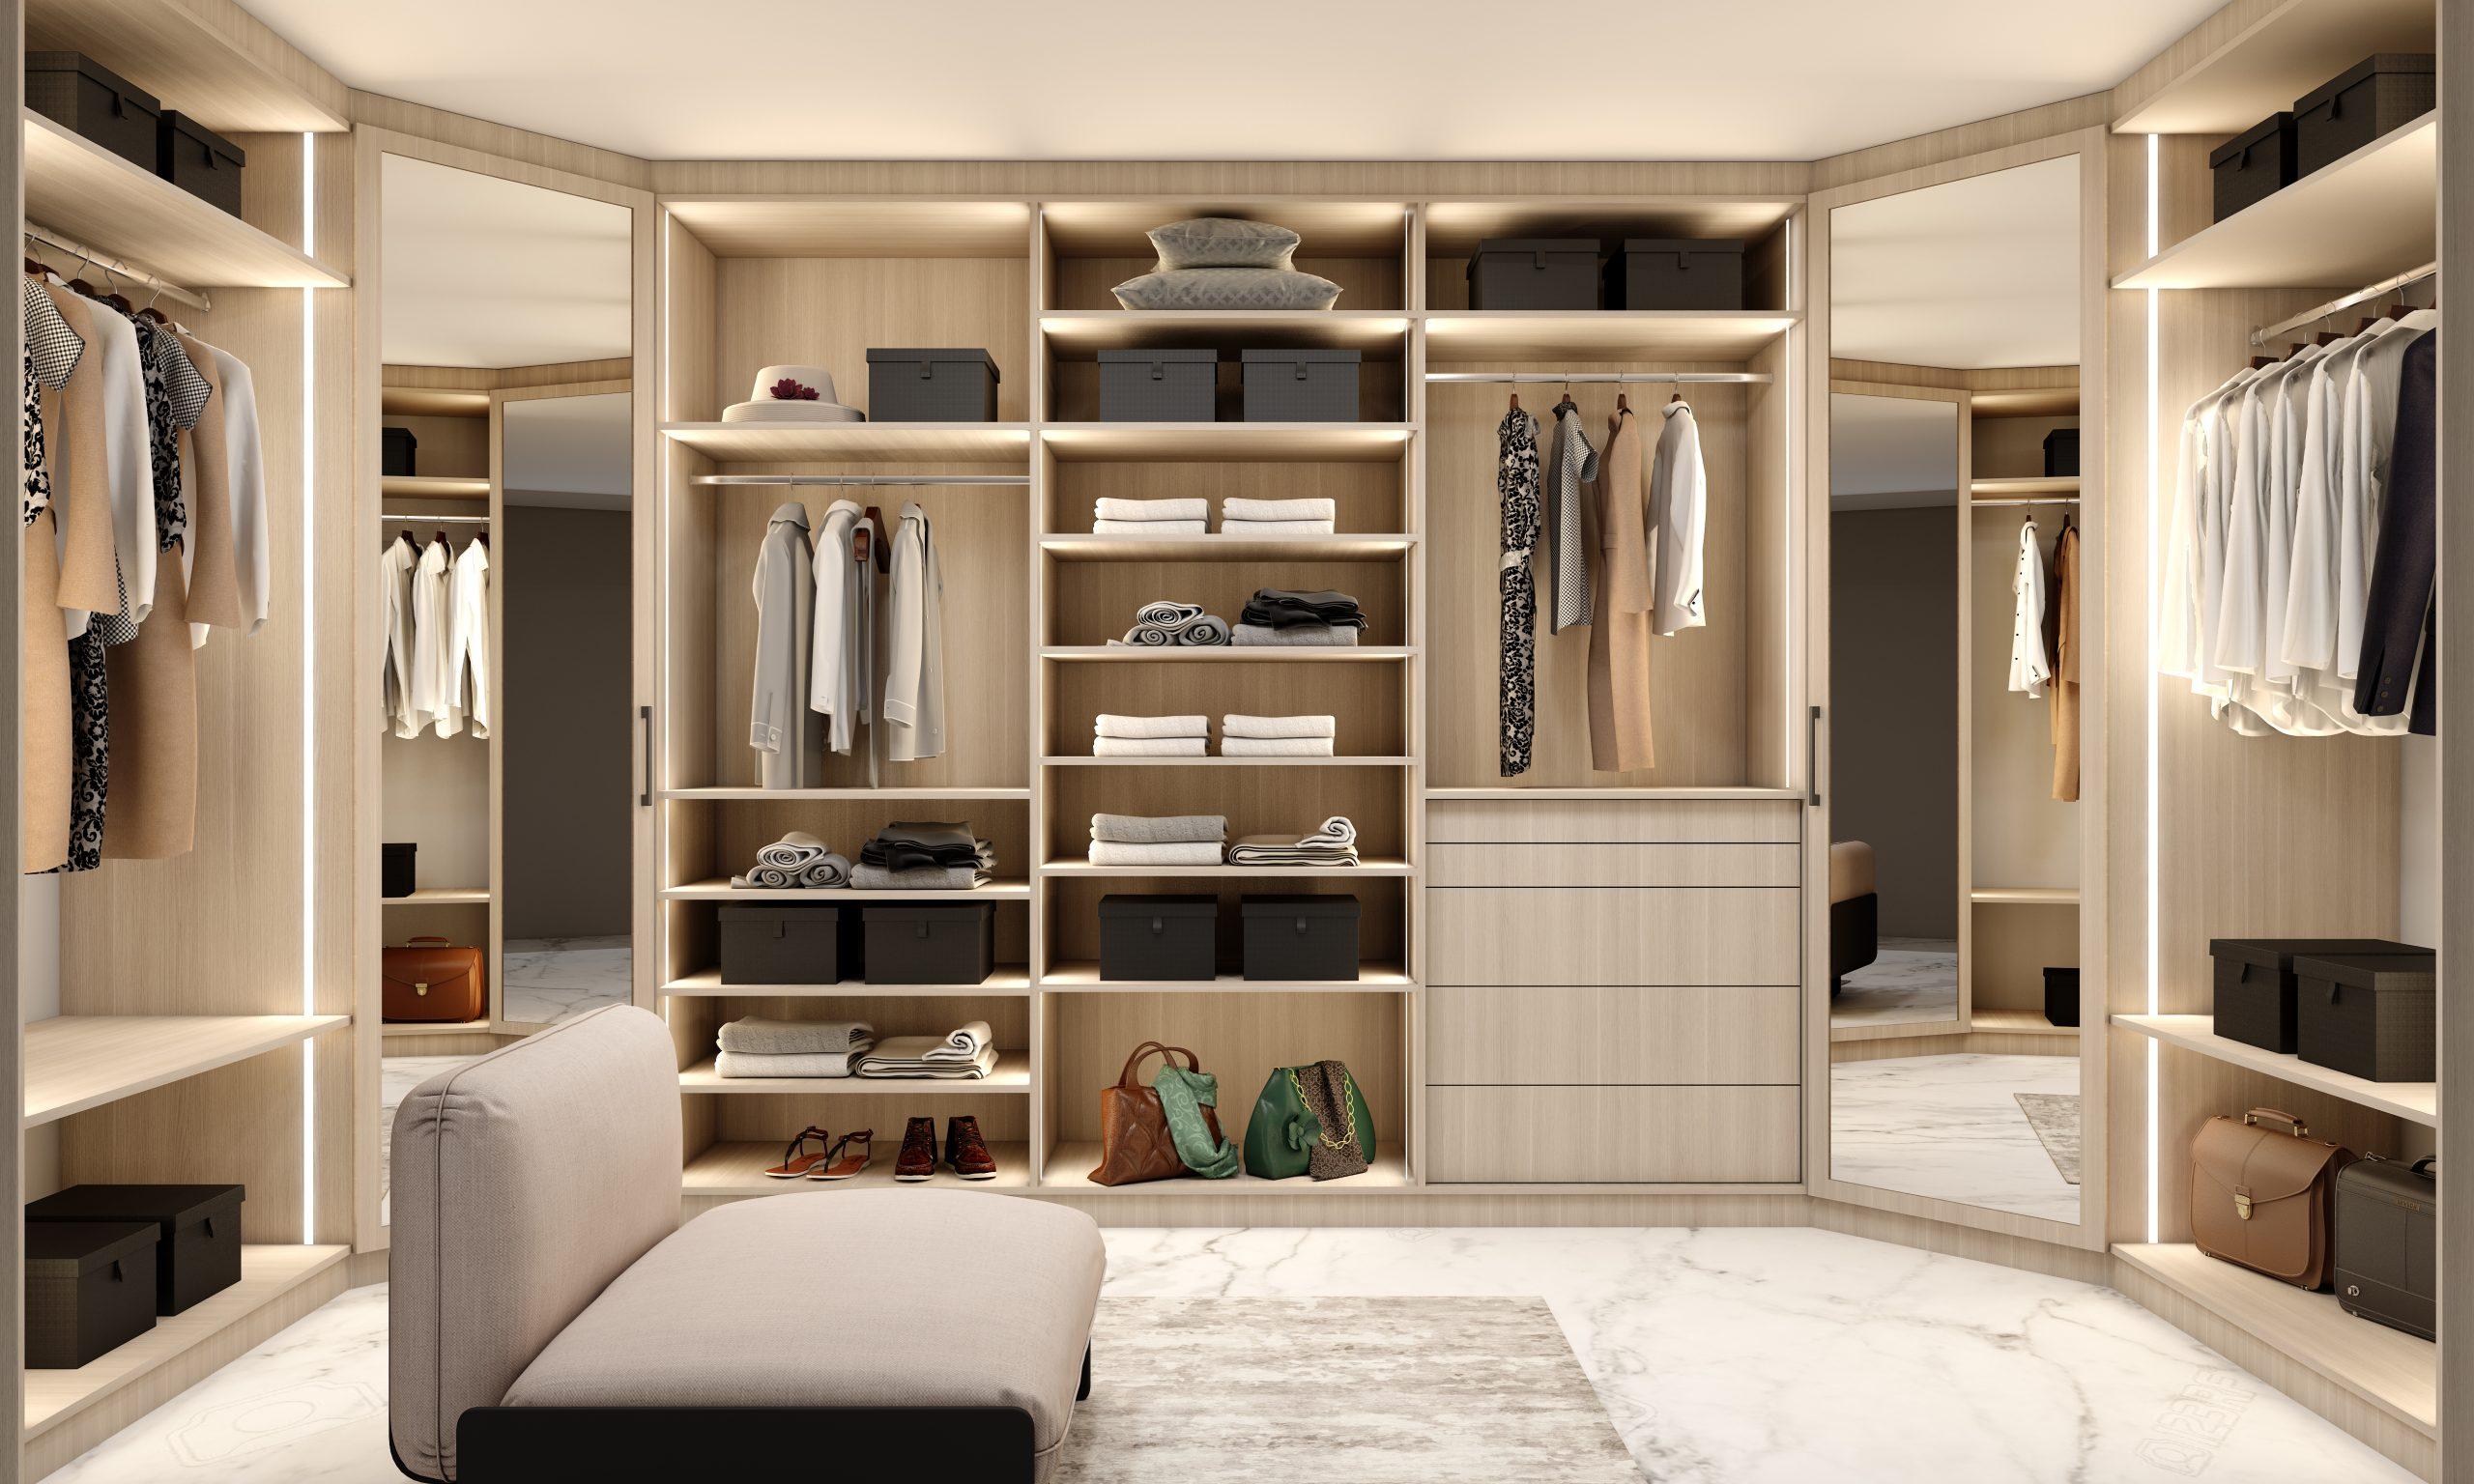 Modern Walk-in Fitted Wardrobe in Sab Oak Finish Light Woodgrain Finish With Framed Mirror Corner Wardrobe